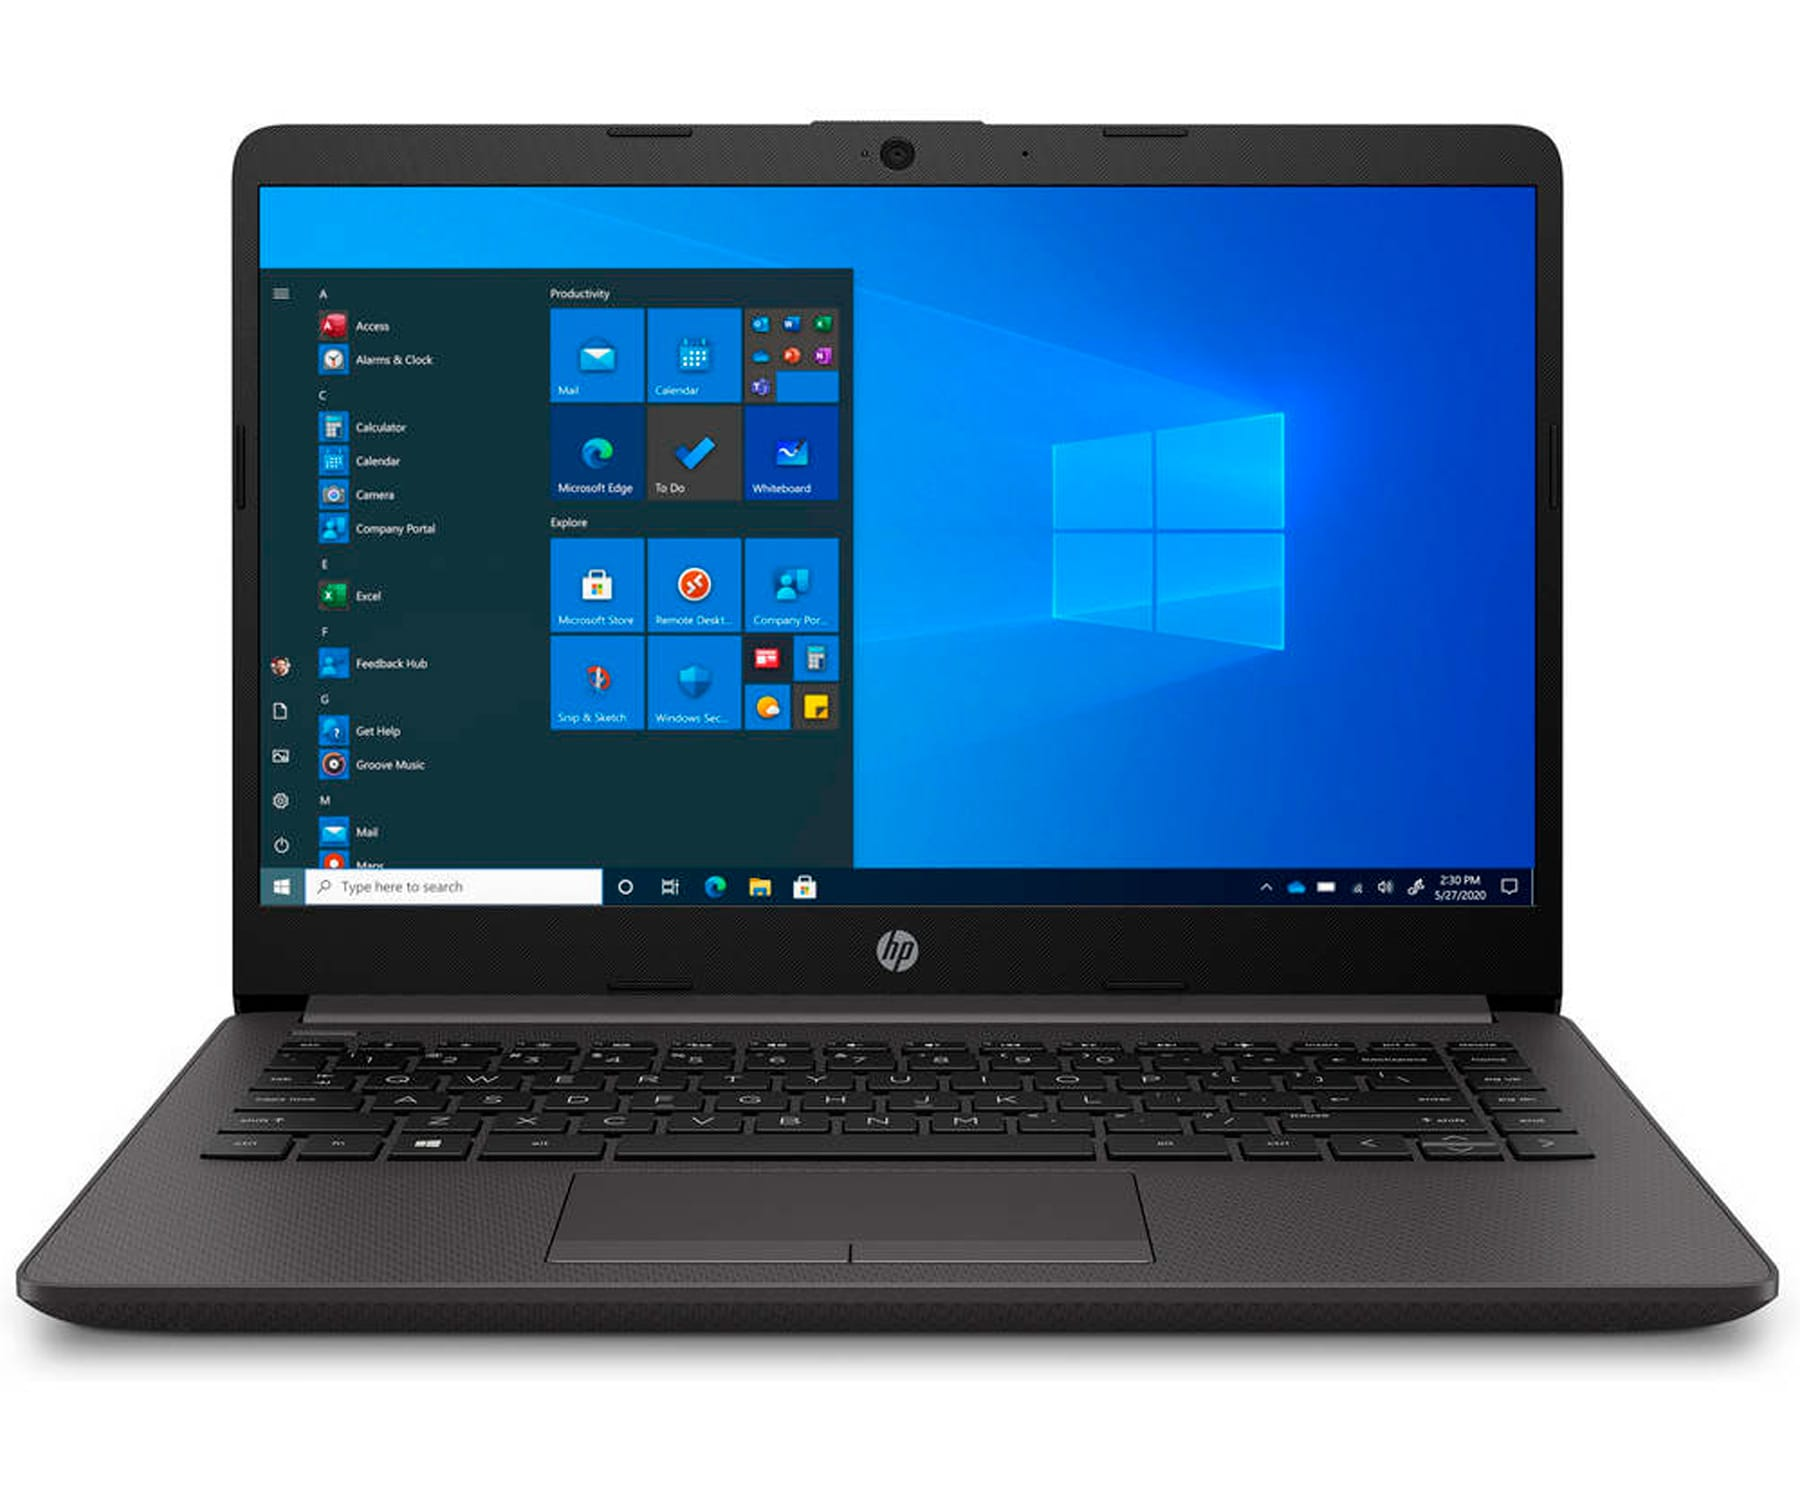 HP NOTEBOOK 240 G8 NEGRO PORTÁTIL 14'' HD CELERON-N4020 128GB SSD 8GB RAM WINDOWS 10 HOME